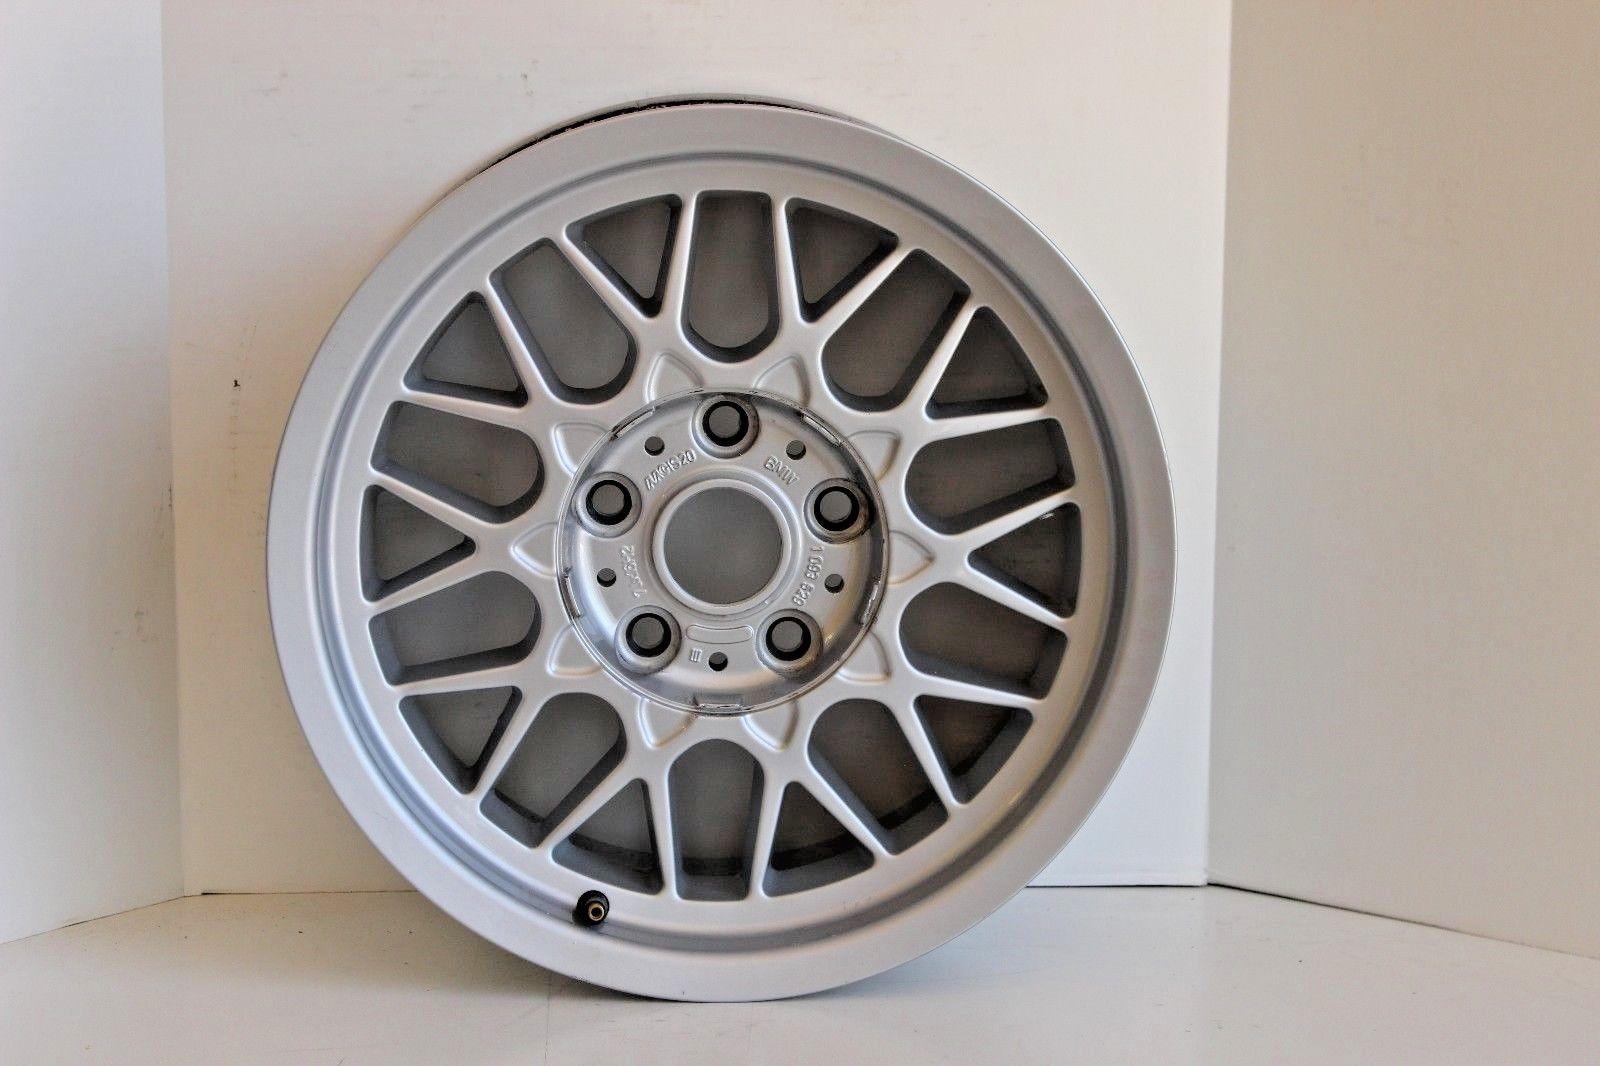 1997 2003 Bmw 525i 528i 530i 540i 16x7 Bbs Keystone Web Alloy Wheel Oem 59250